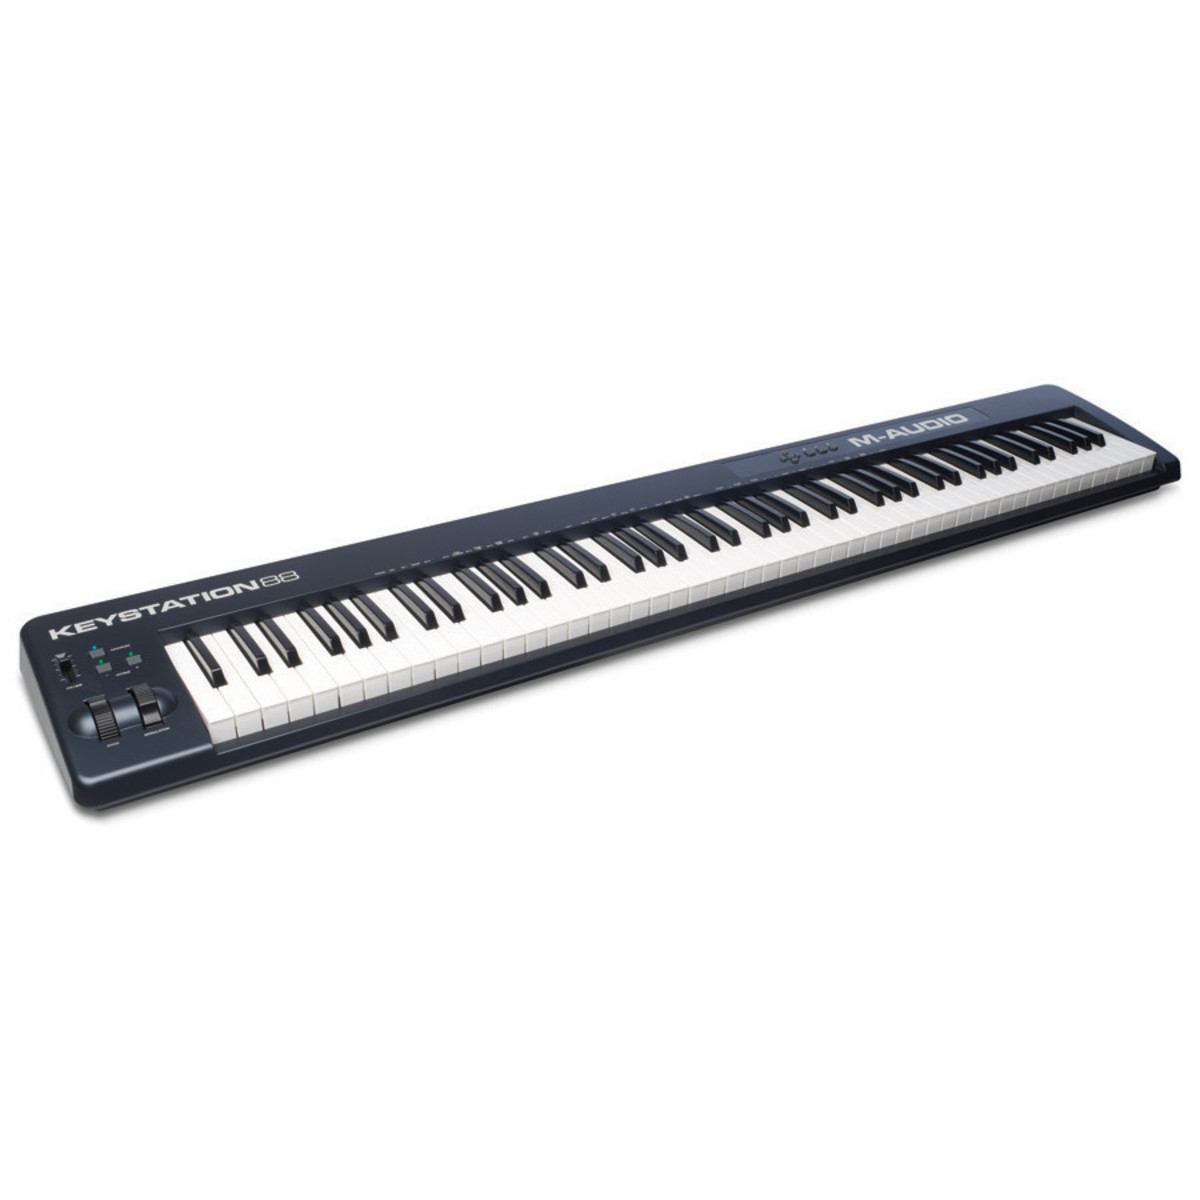 m audio keystation 88 ii usb controller at gear4music. Black Bedroom Furniture Sets. Home Design Ideas